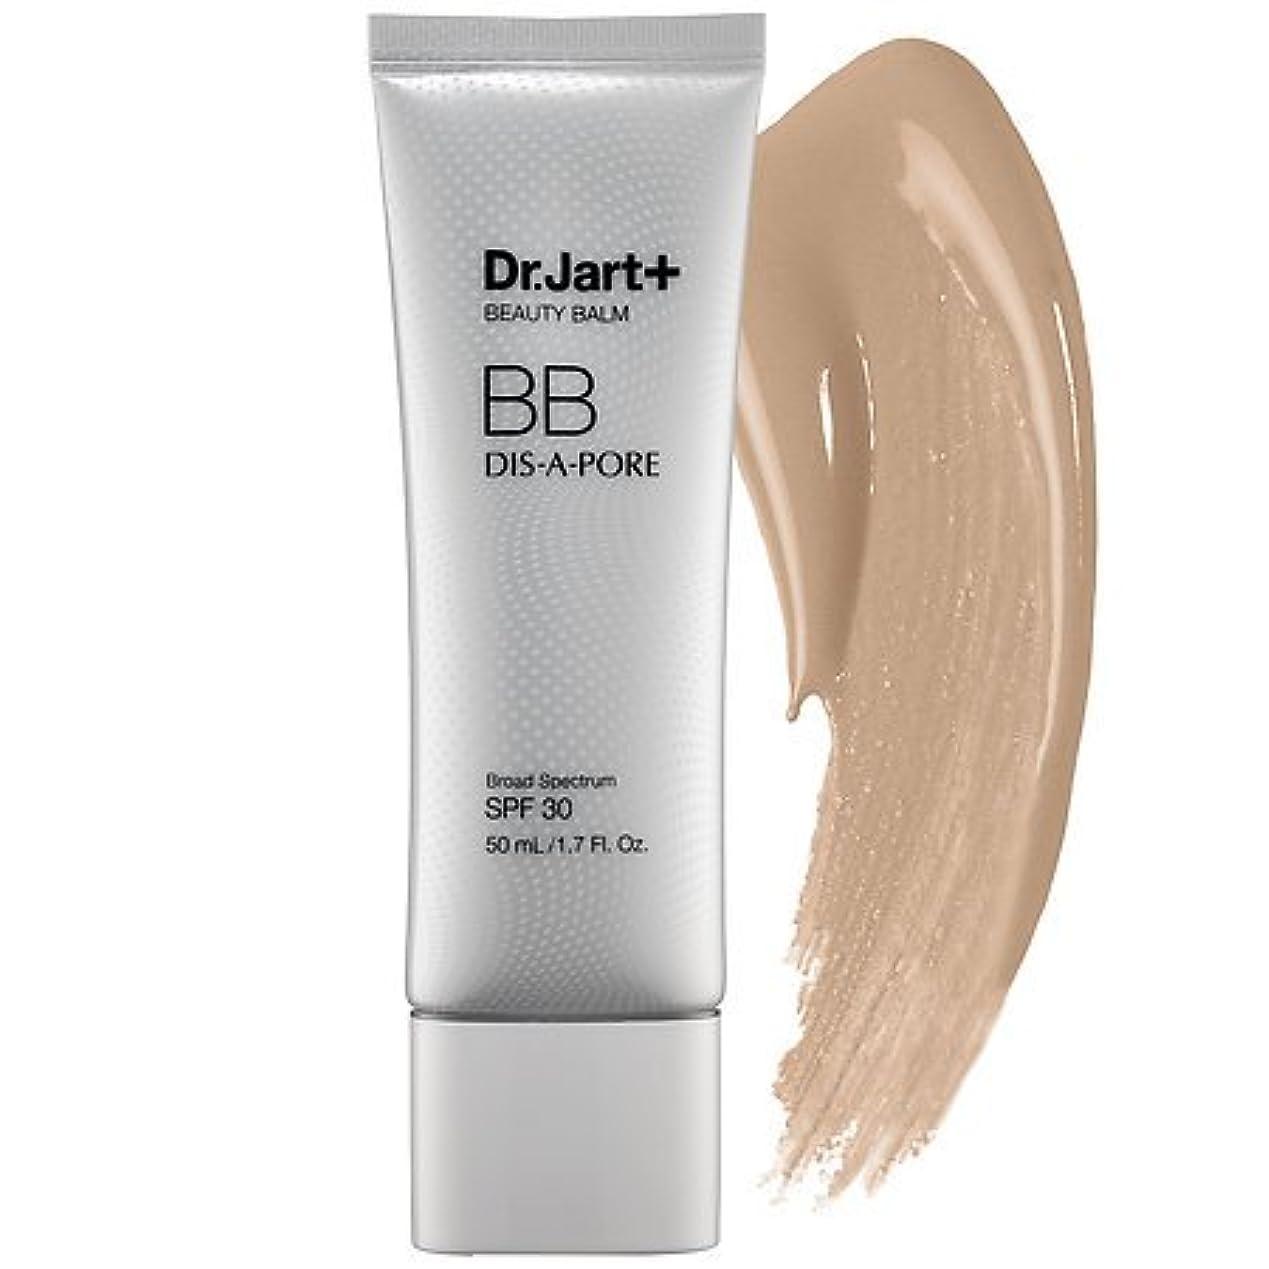 状況セール細部Dr.Jart+ Dis-A-Pore Beauty Balm SPF30_1.7oz [02 Medium-Deep] …